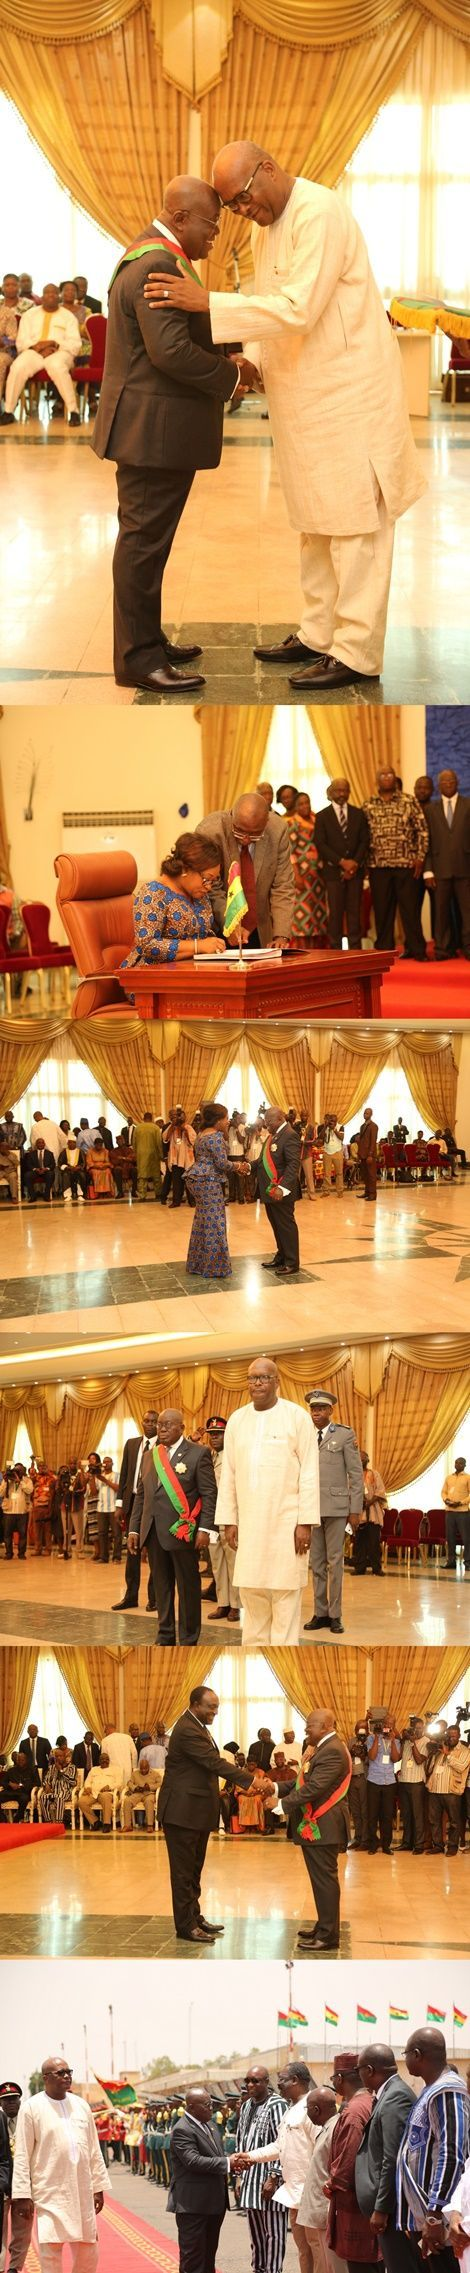 PHOTOS: Ghana, Burkina Faso Pledge To Strengthen Bilateral Ties | Politics | Peacefmonline.com